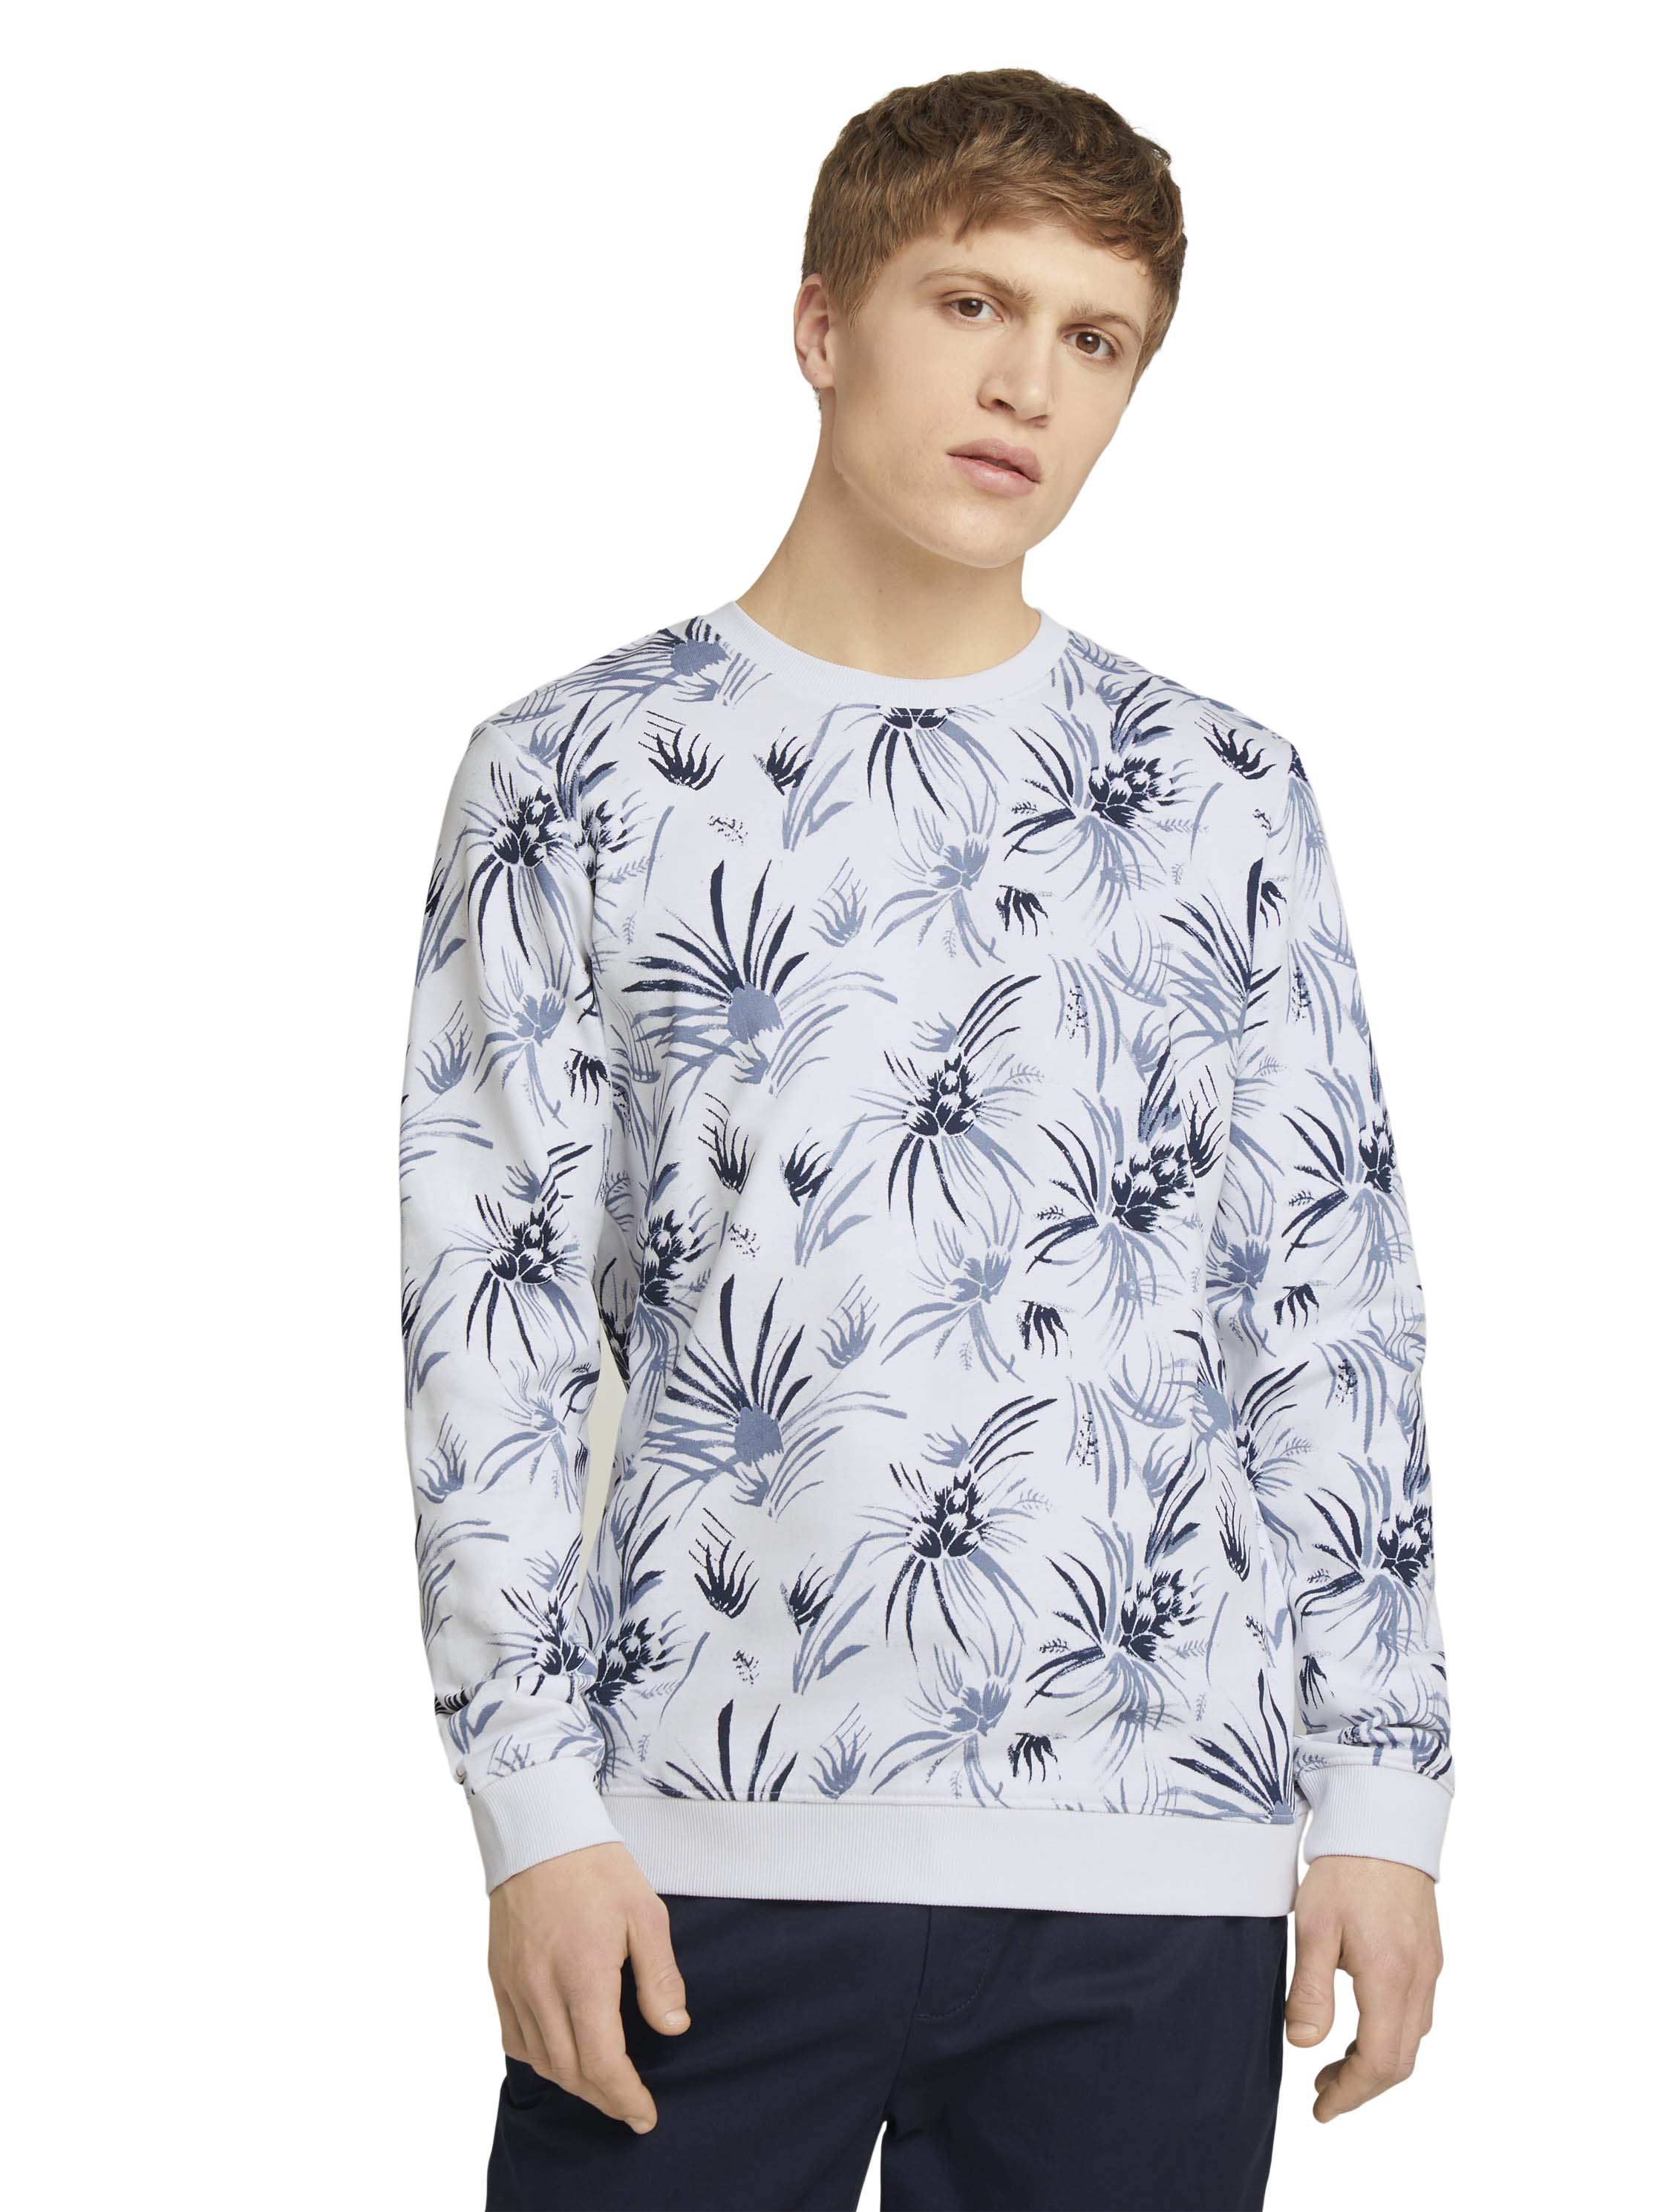 Tom Tailor Denim Sweatshirt